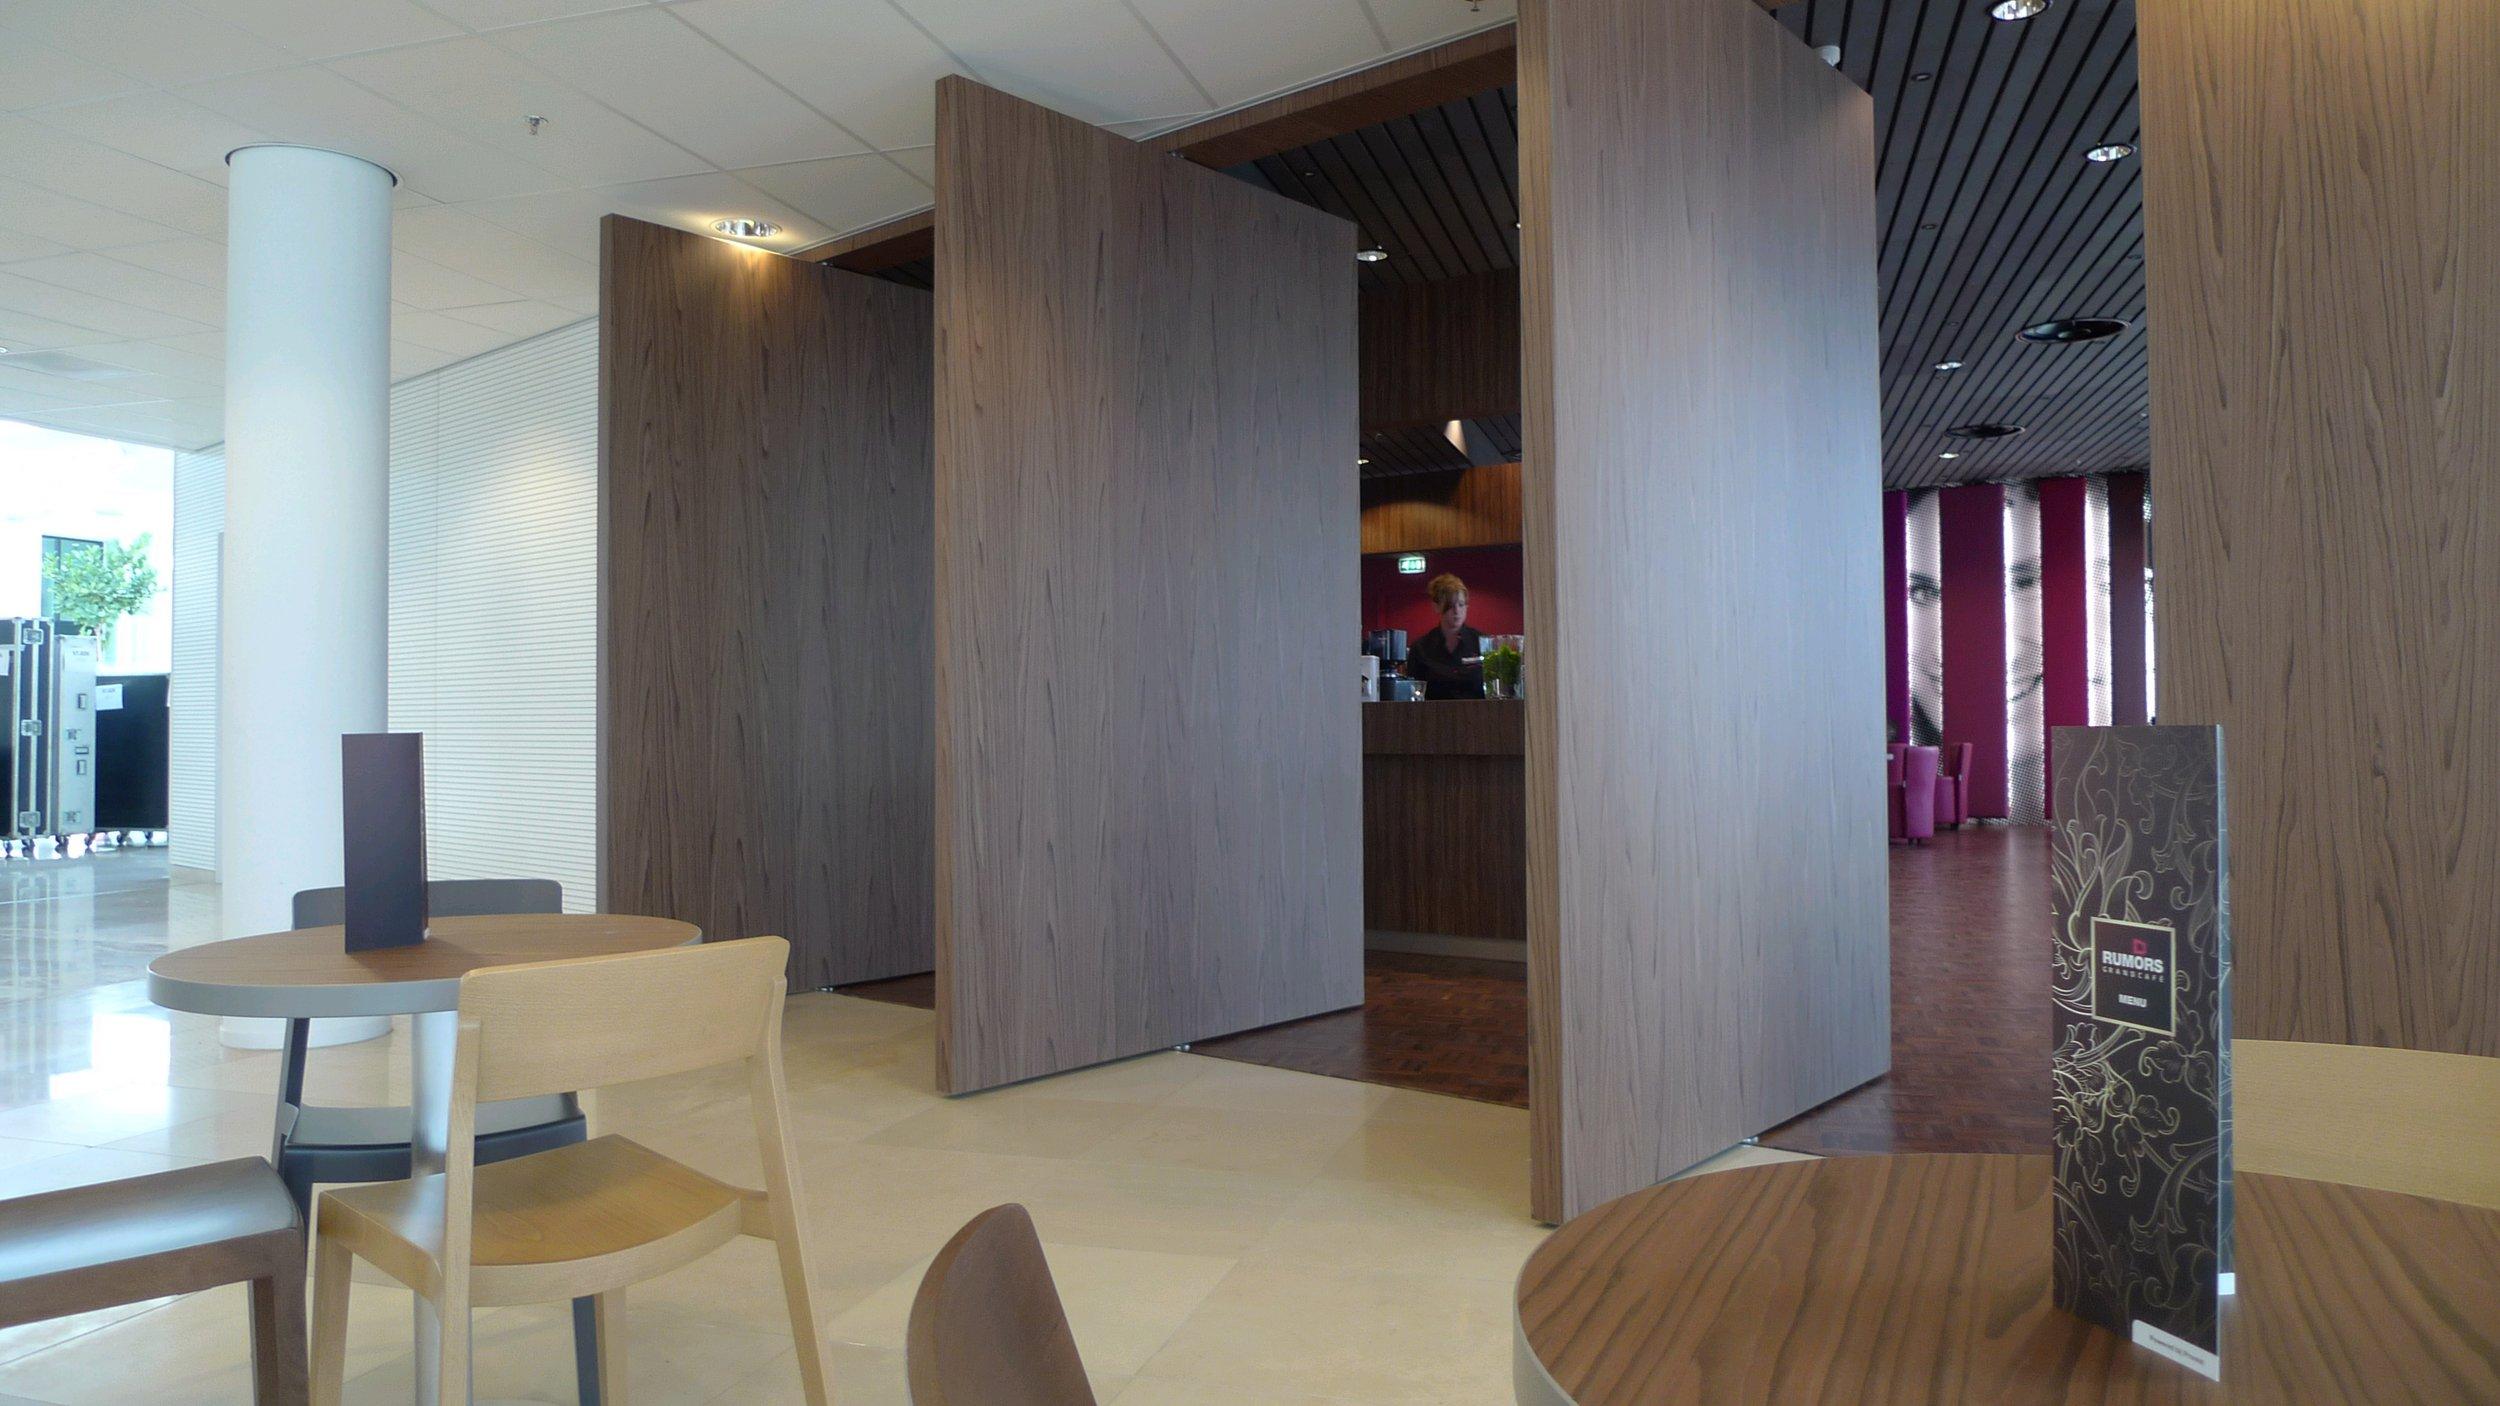 FritsJurgens-taatsdeuren-Endemol1.jpg